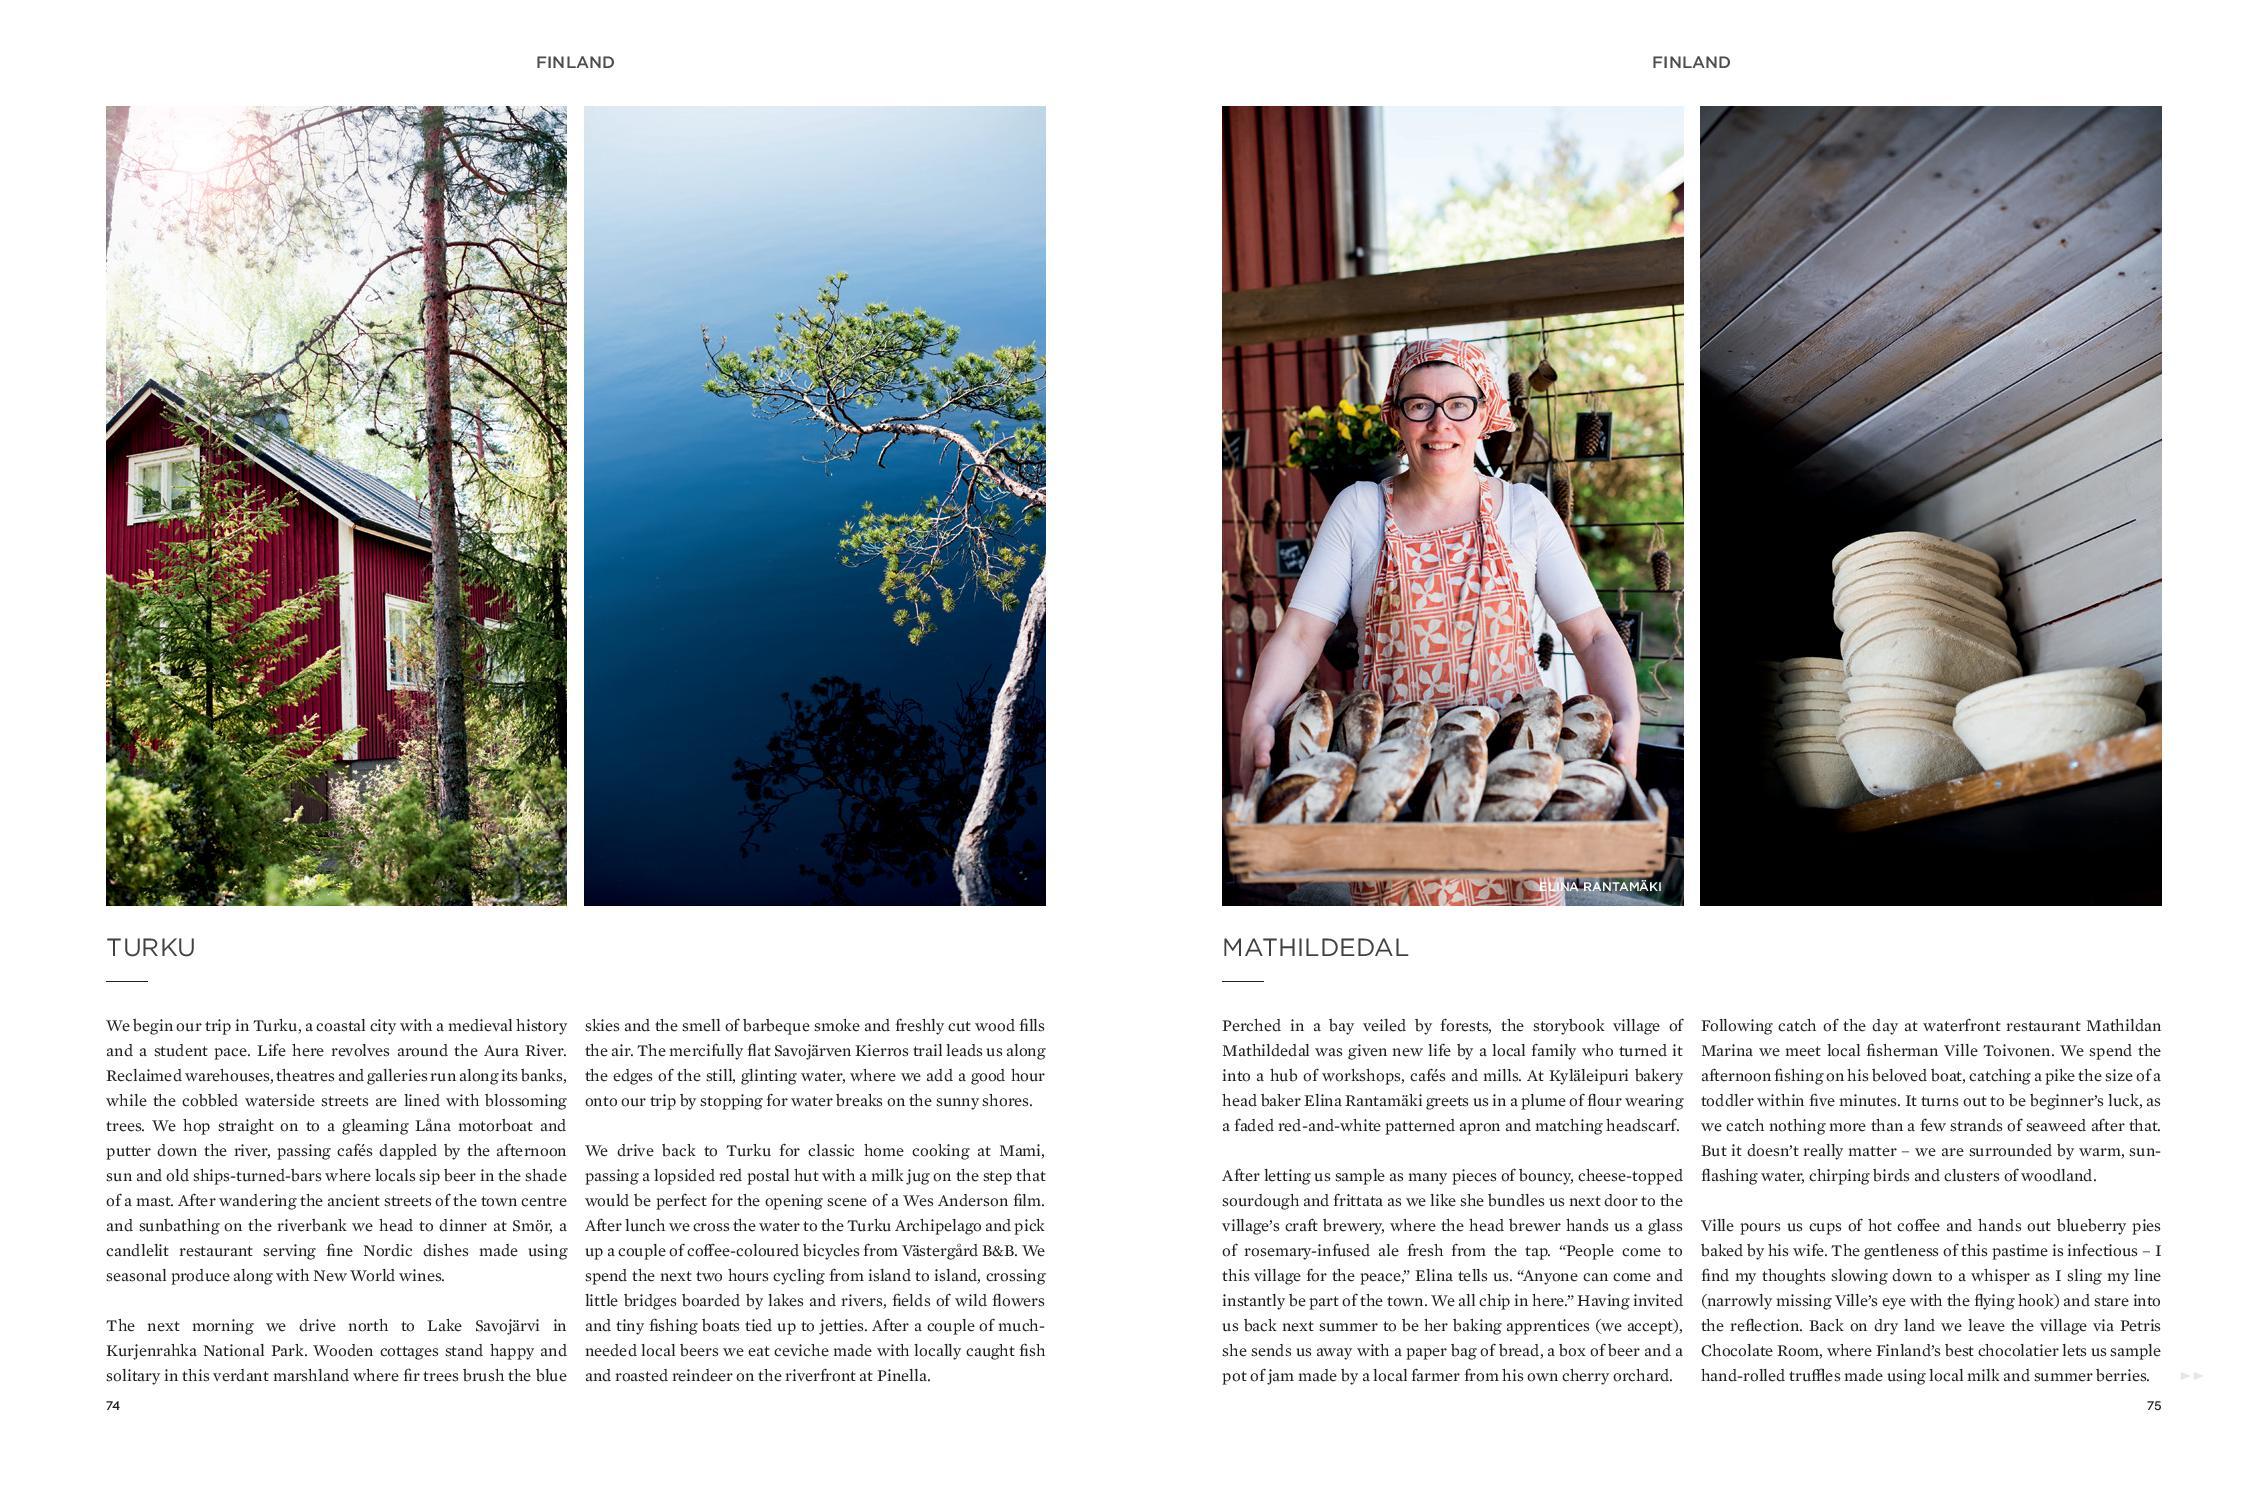 Finland-page-003.jpg